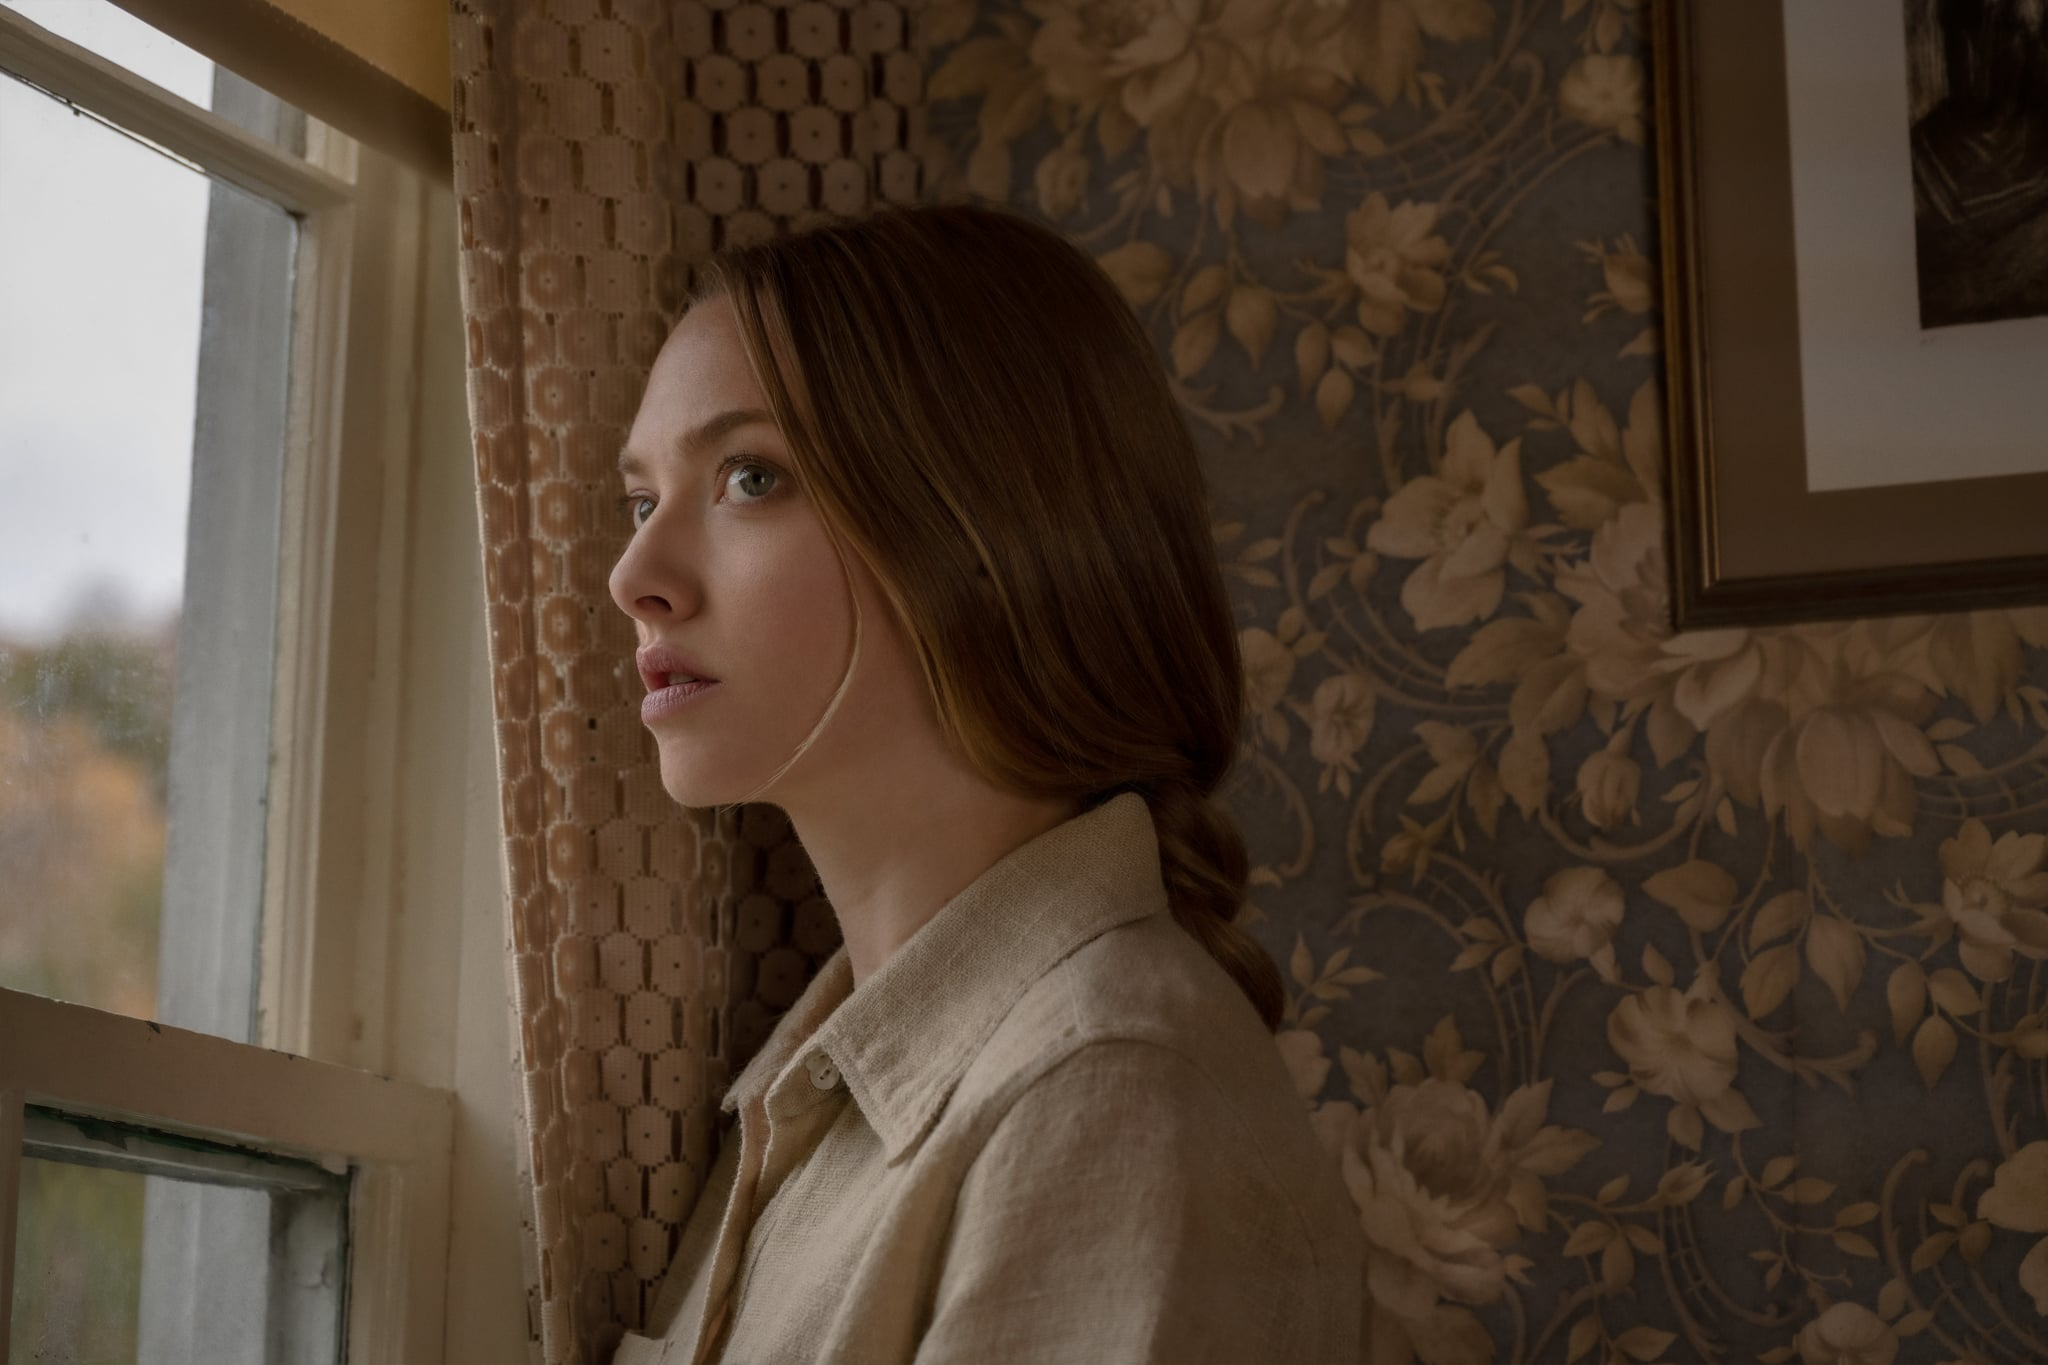 Things Heard And Seen: Amanda Seyfried as Catherine Clare. Cr. Anna Kooris/NETFLIX © 2020.